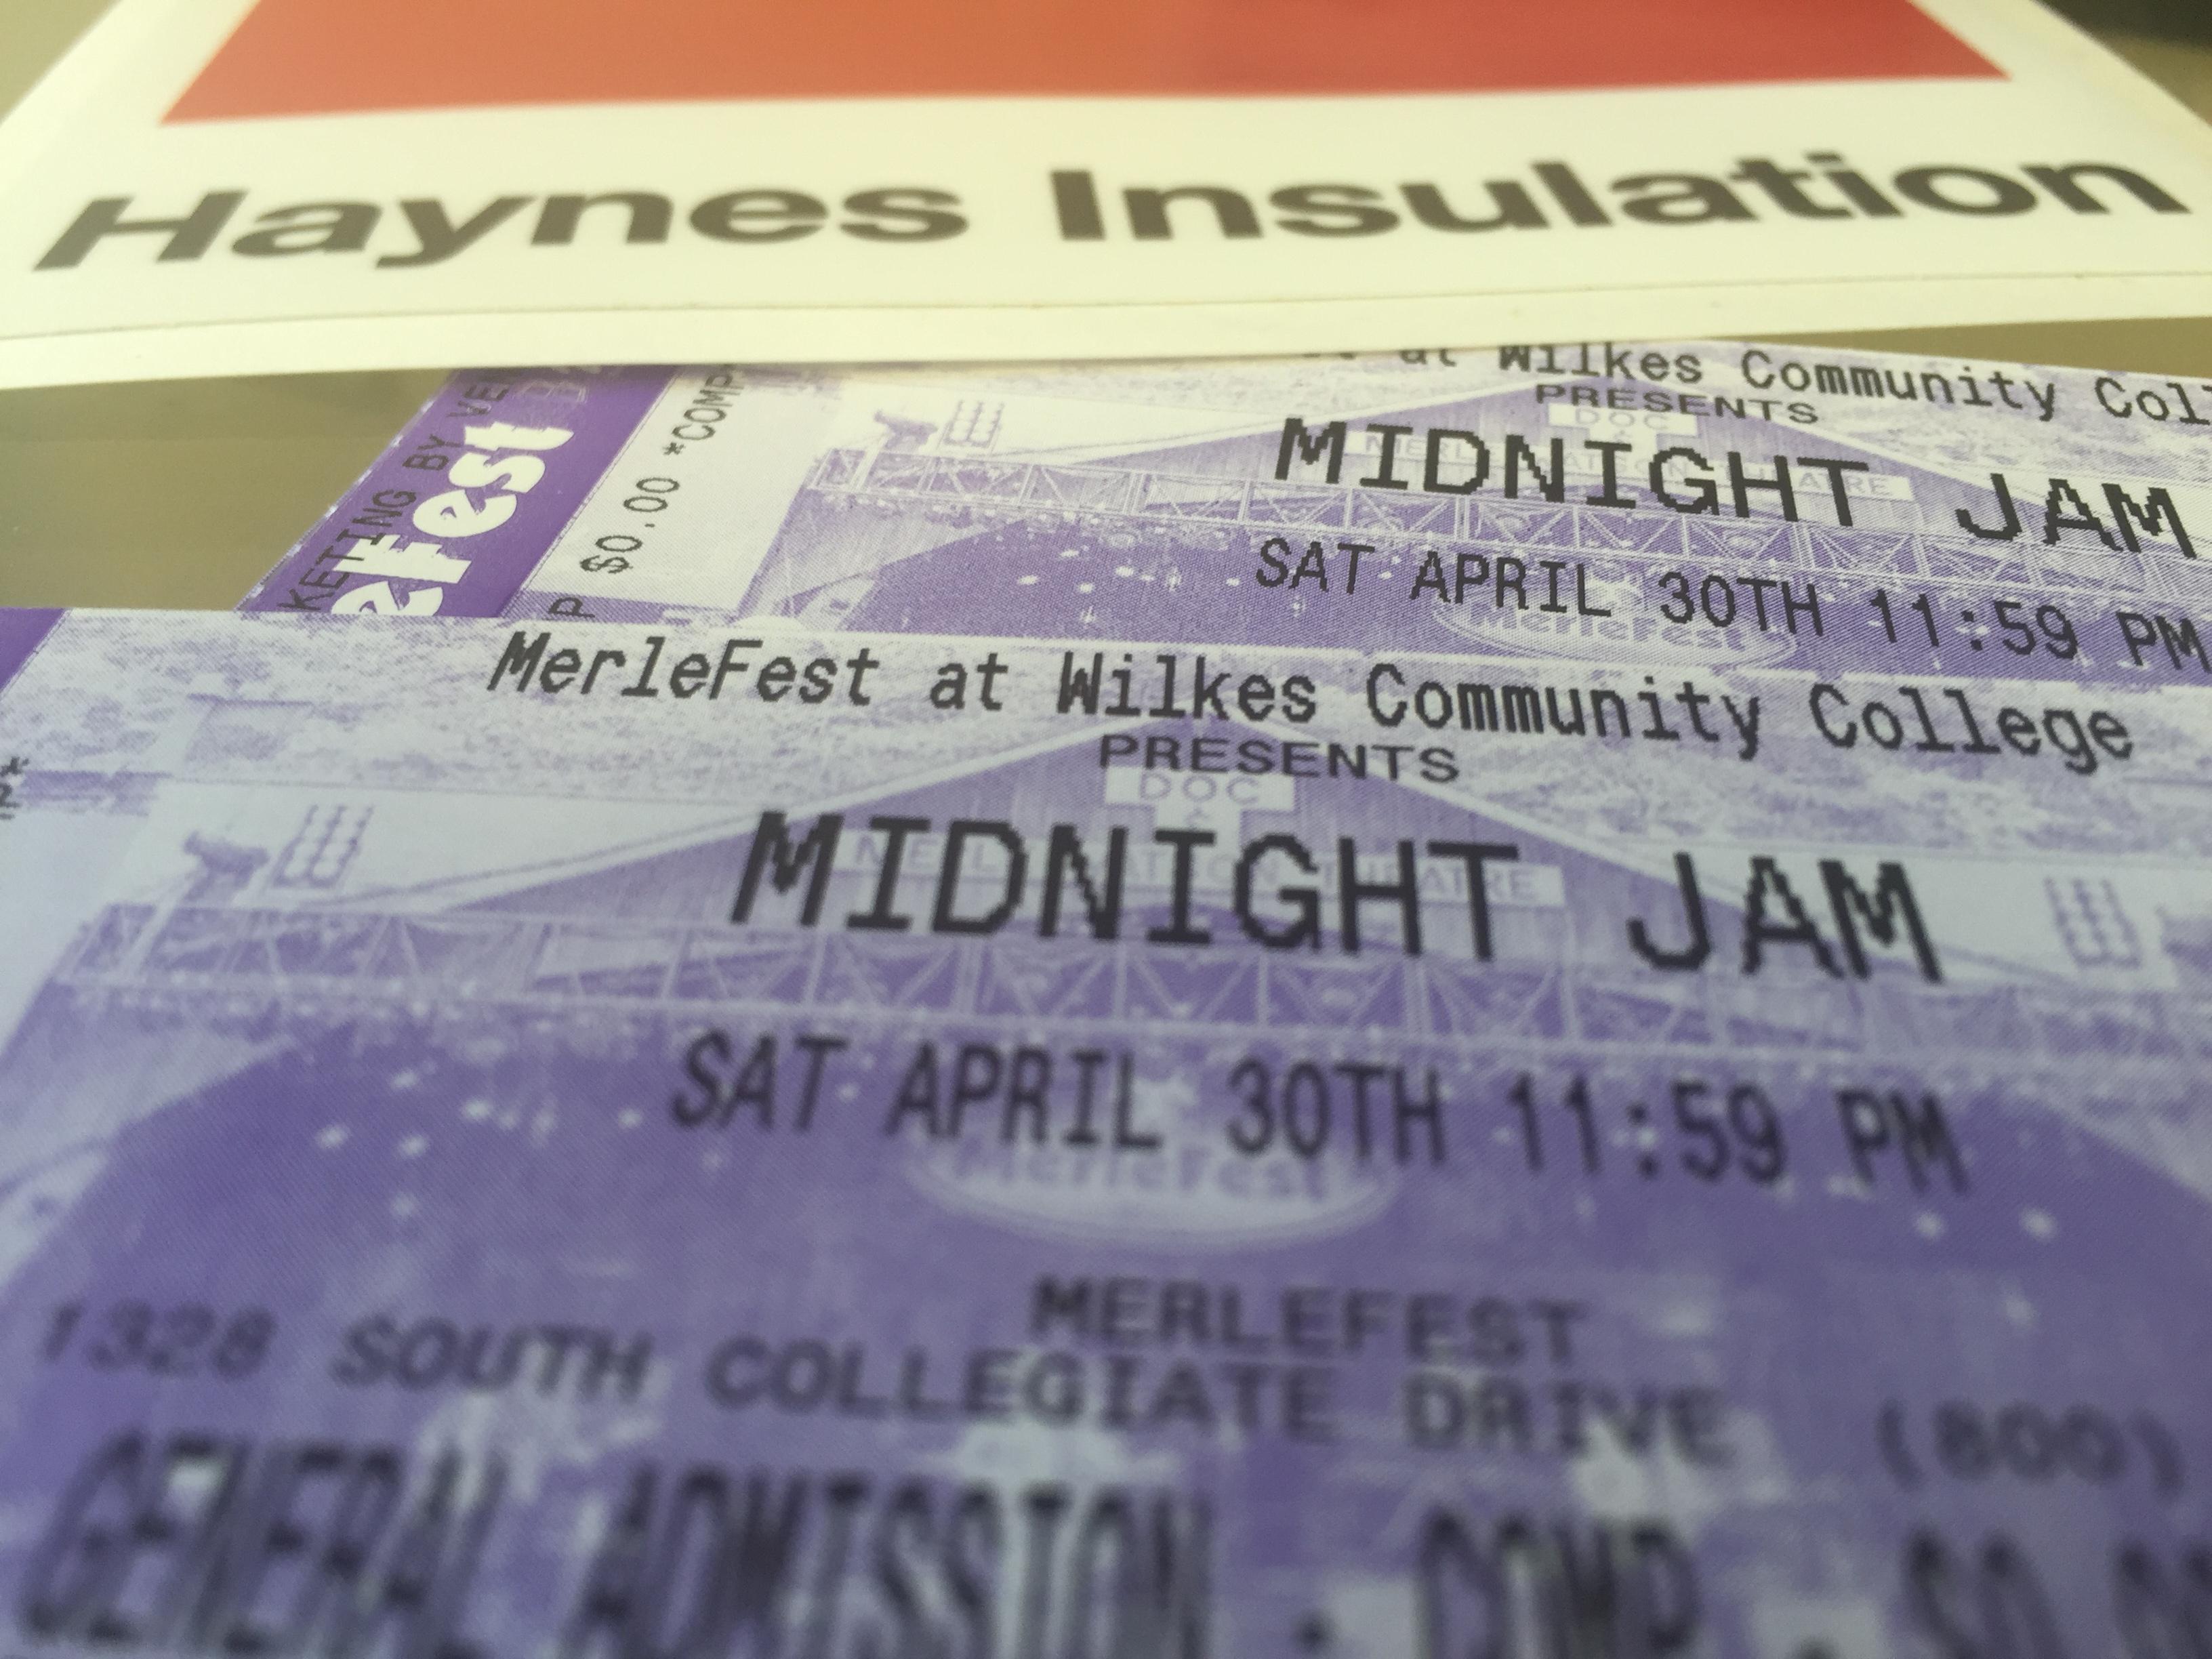 We gave away Midnight Jam Tickets!